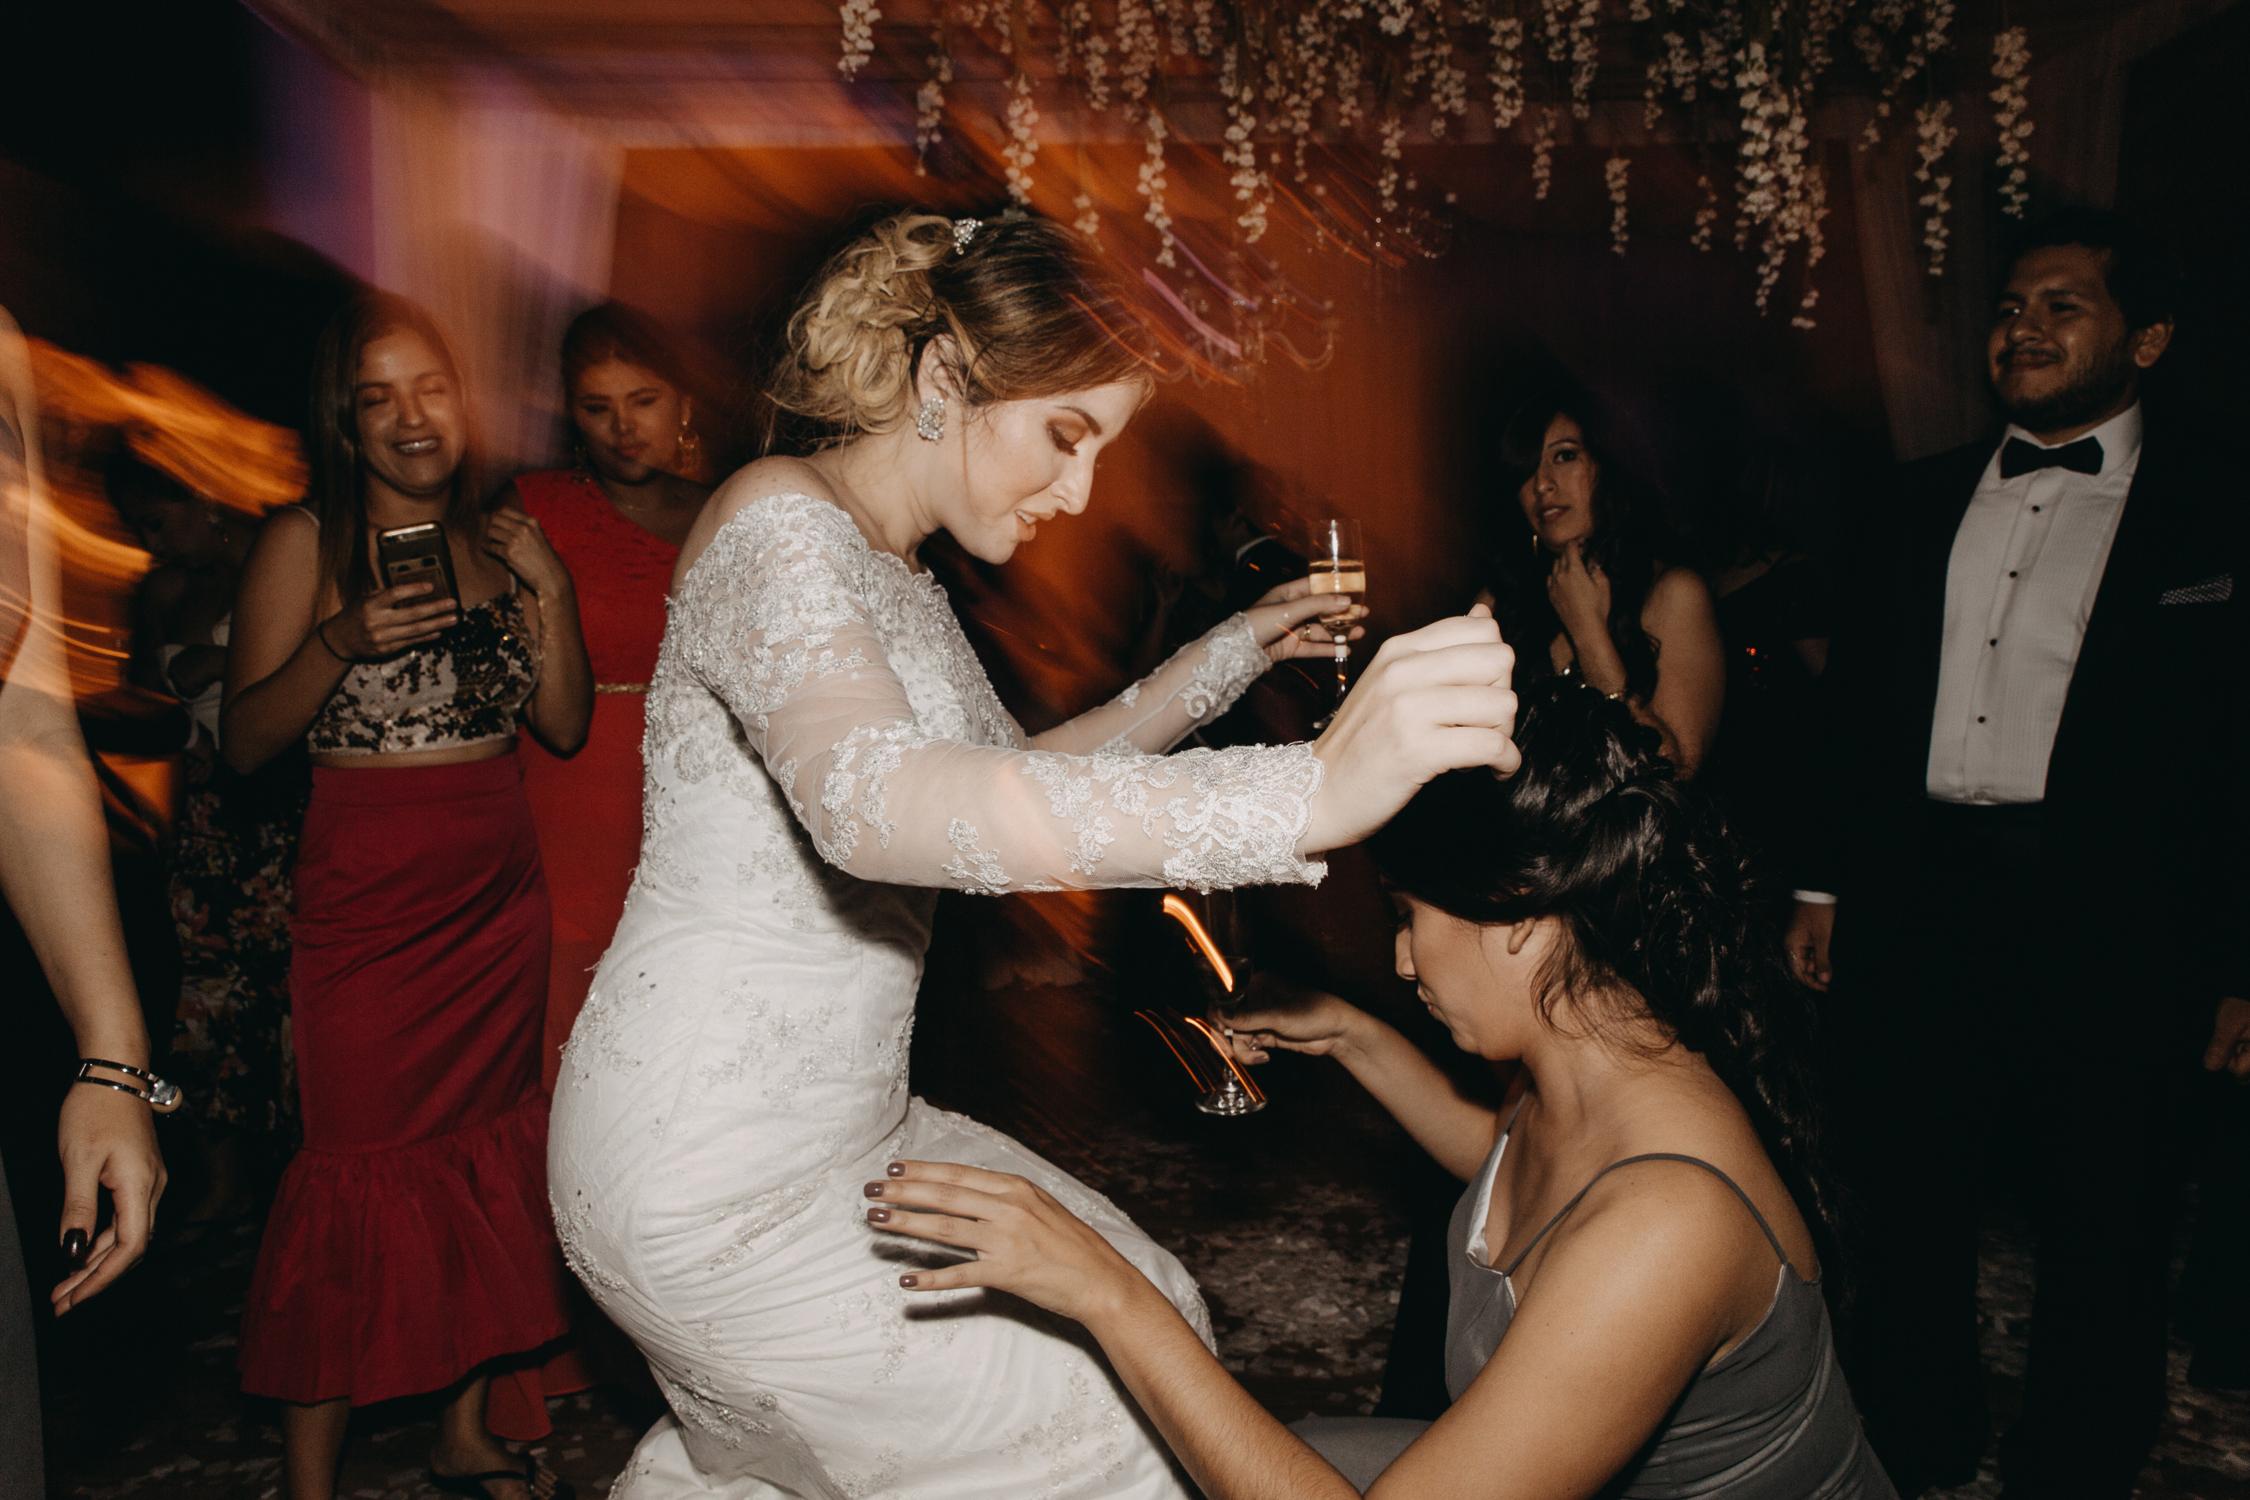 Michelle-Agurto-Fotografia-Bodas-Ecuador-Destination-Wedding-Photographer-Vicky-Javier-273.JPG